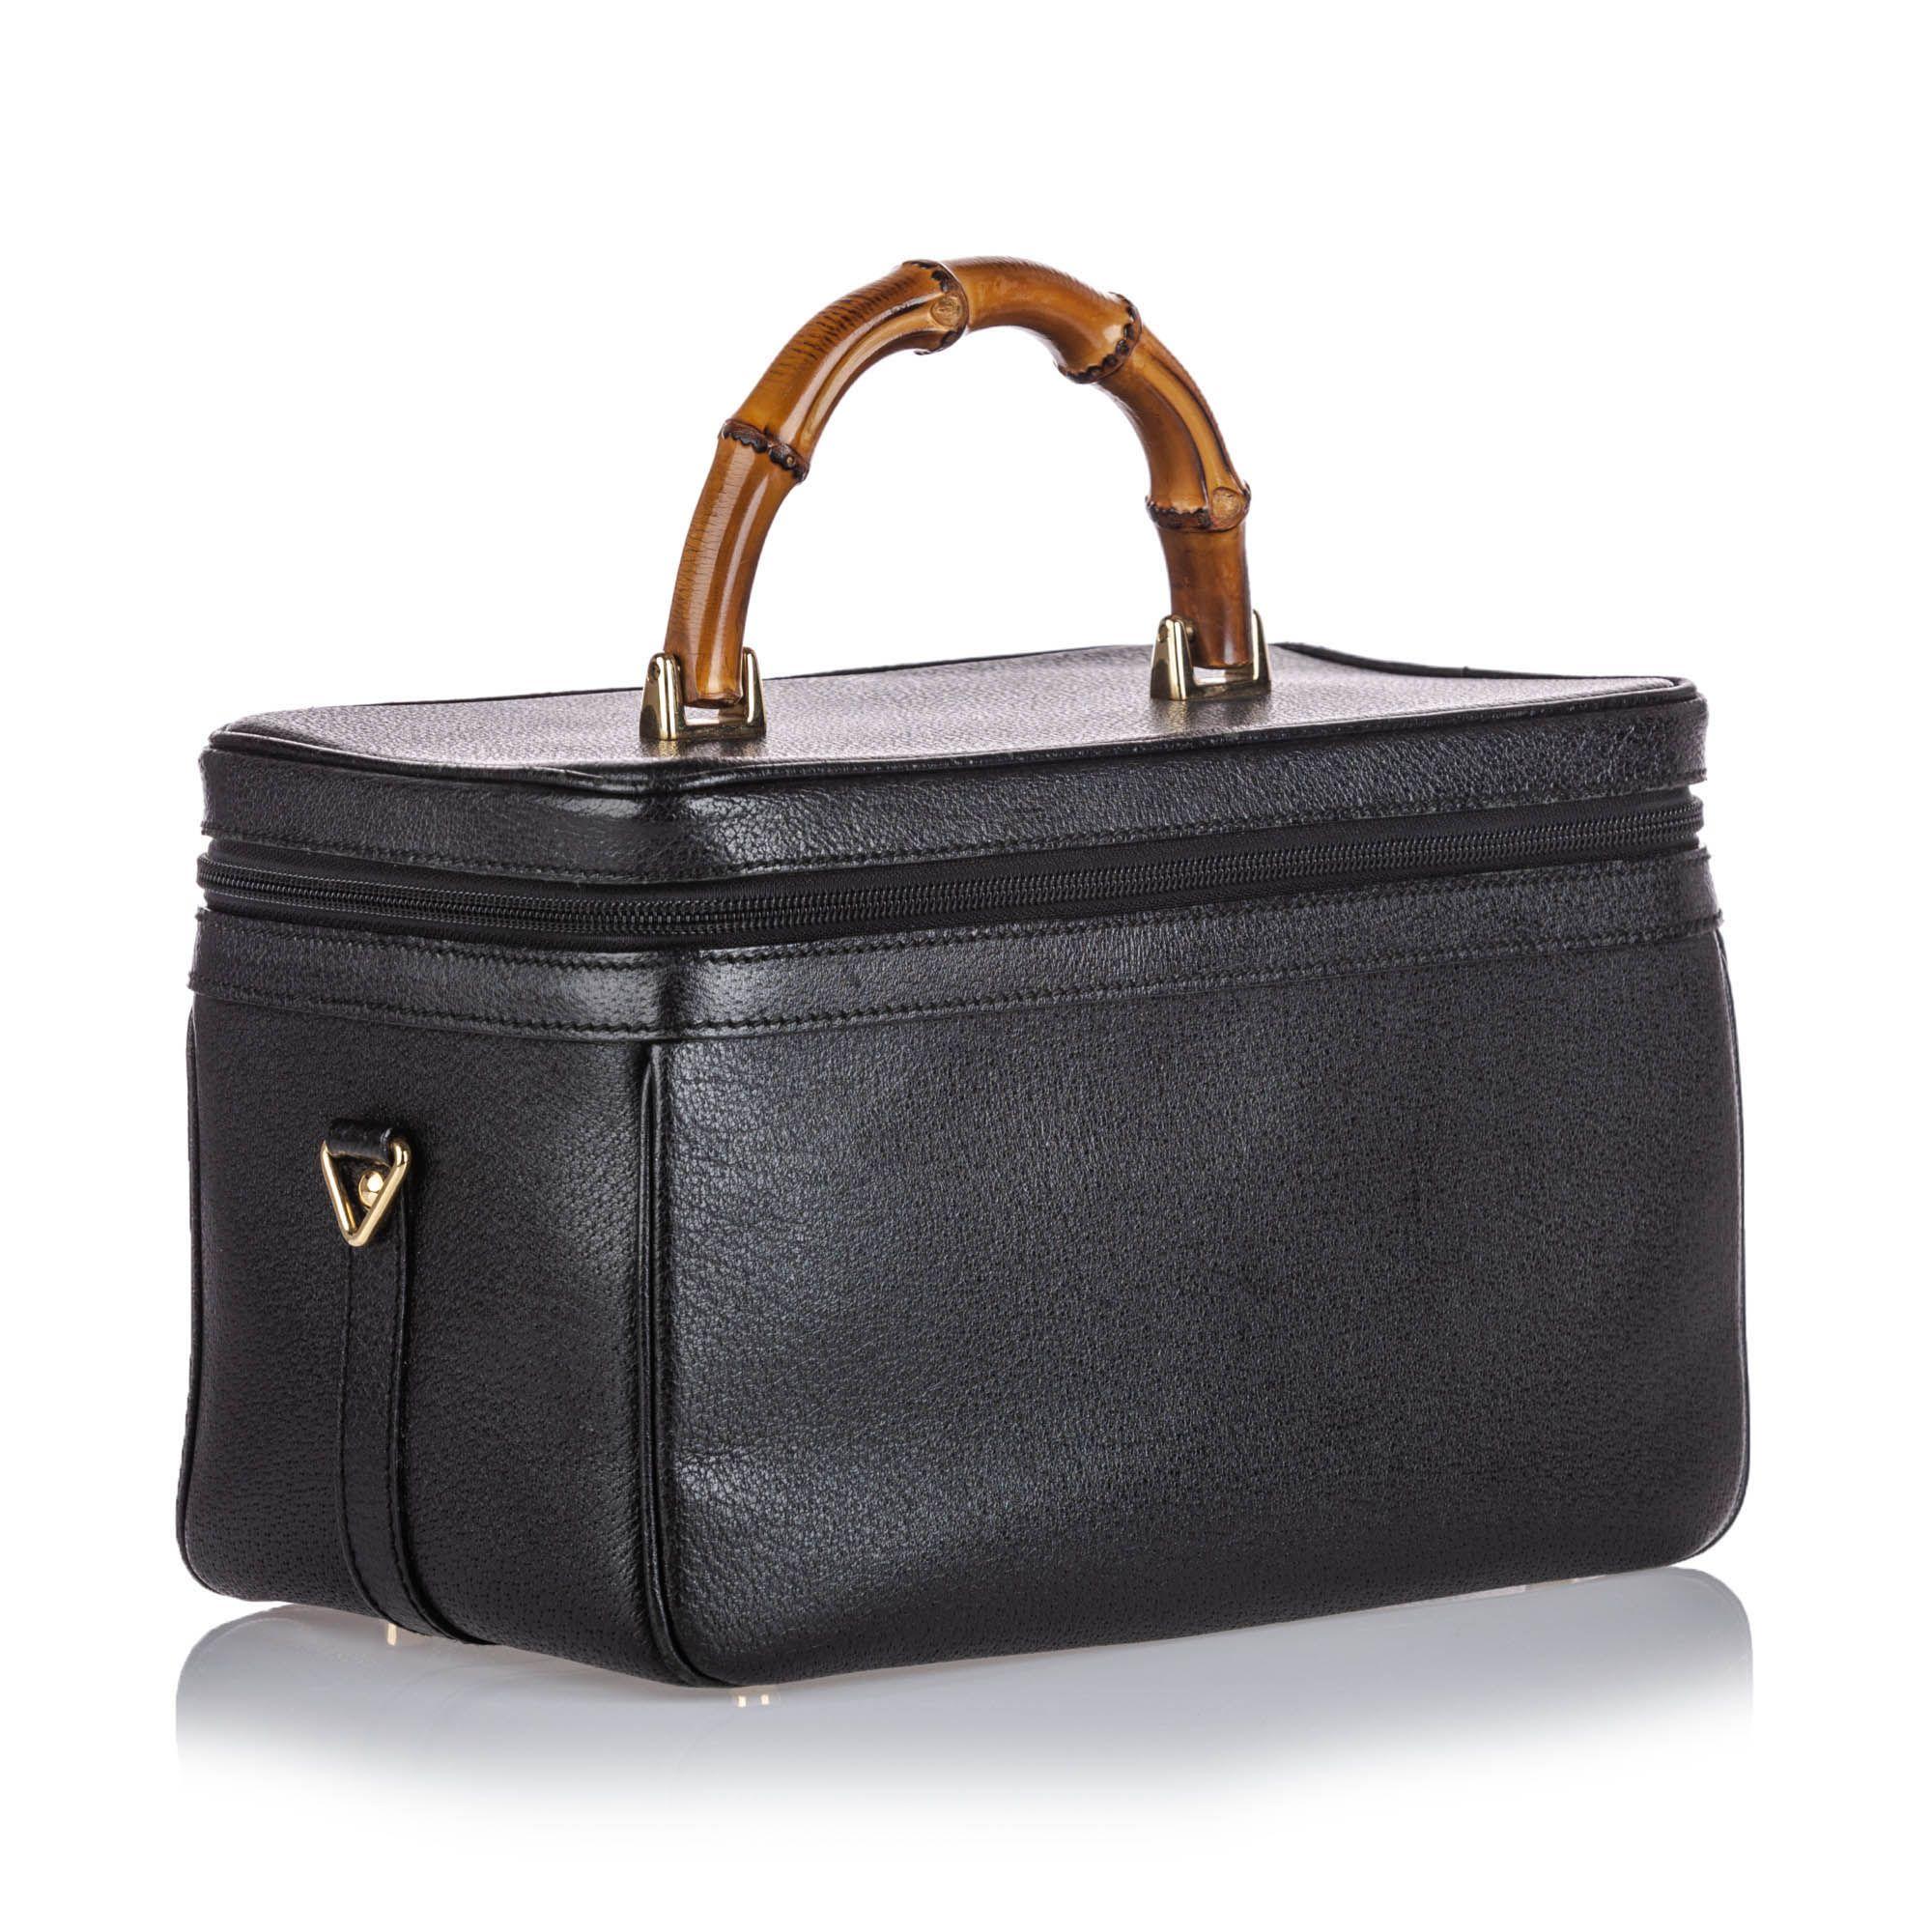 Vintage Gucci Bamboo Leather Vanity Bag Black